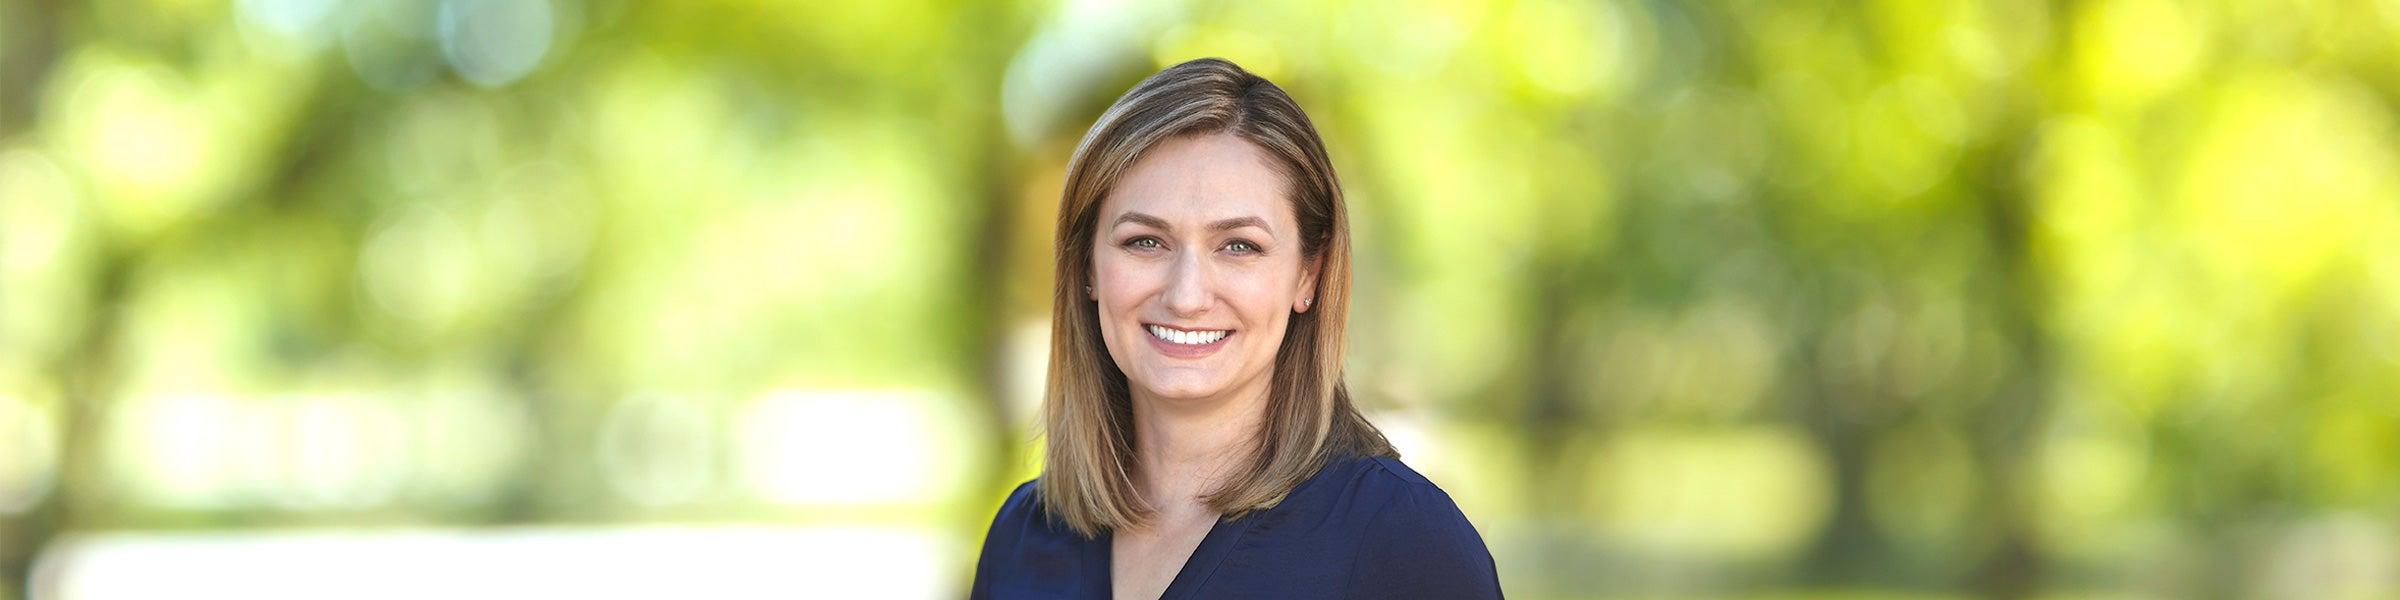 Linda Rendle Clorox CEO